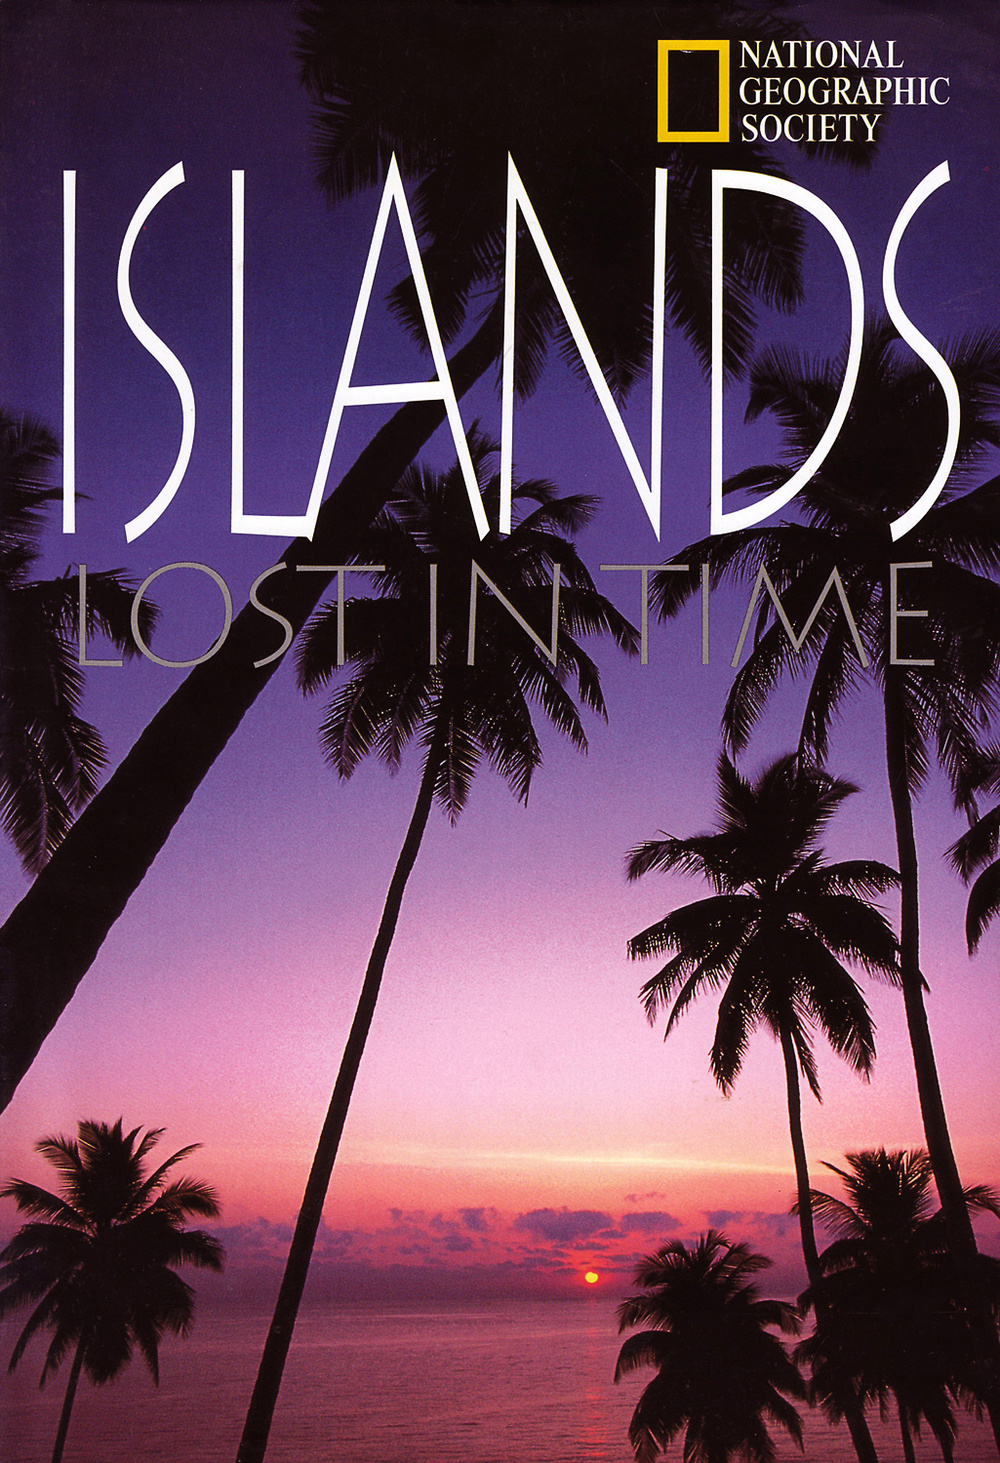 IslandsLostinTime-.jpg